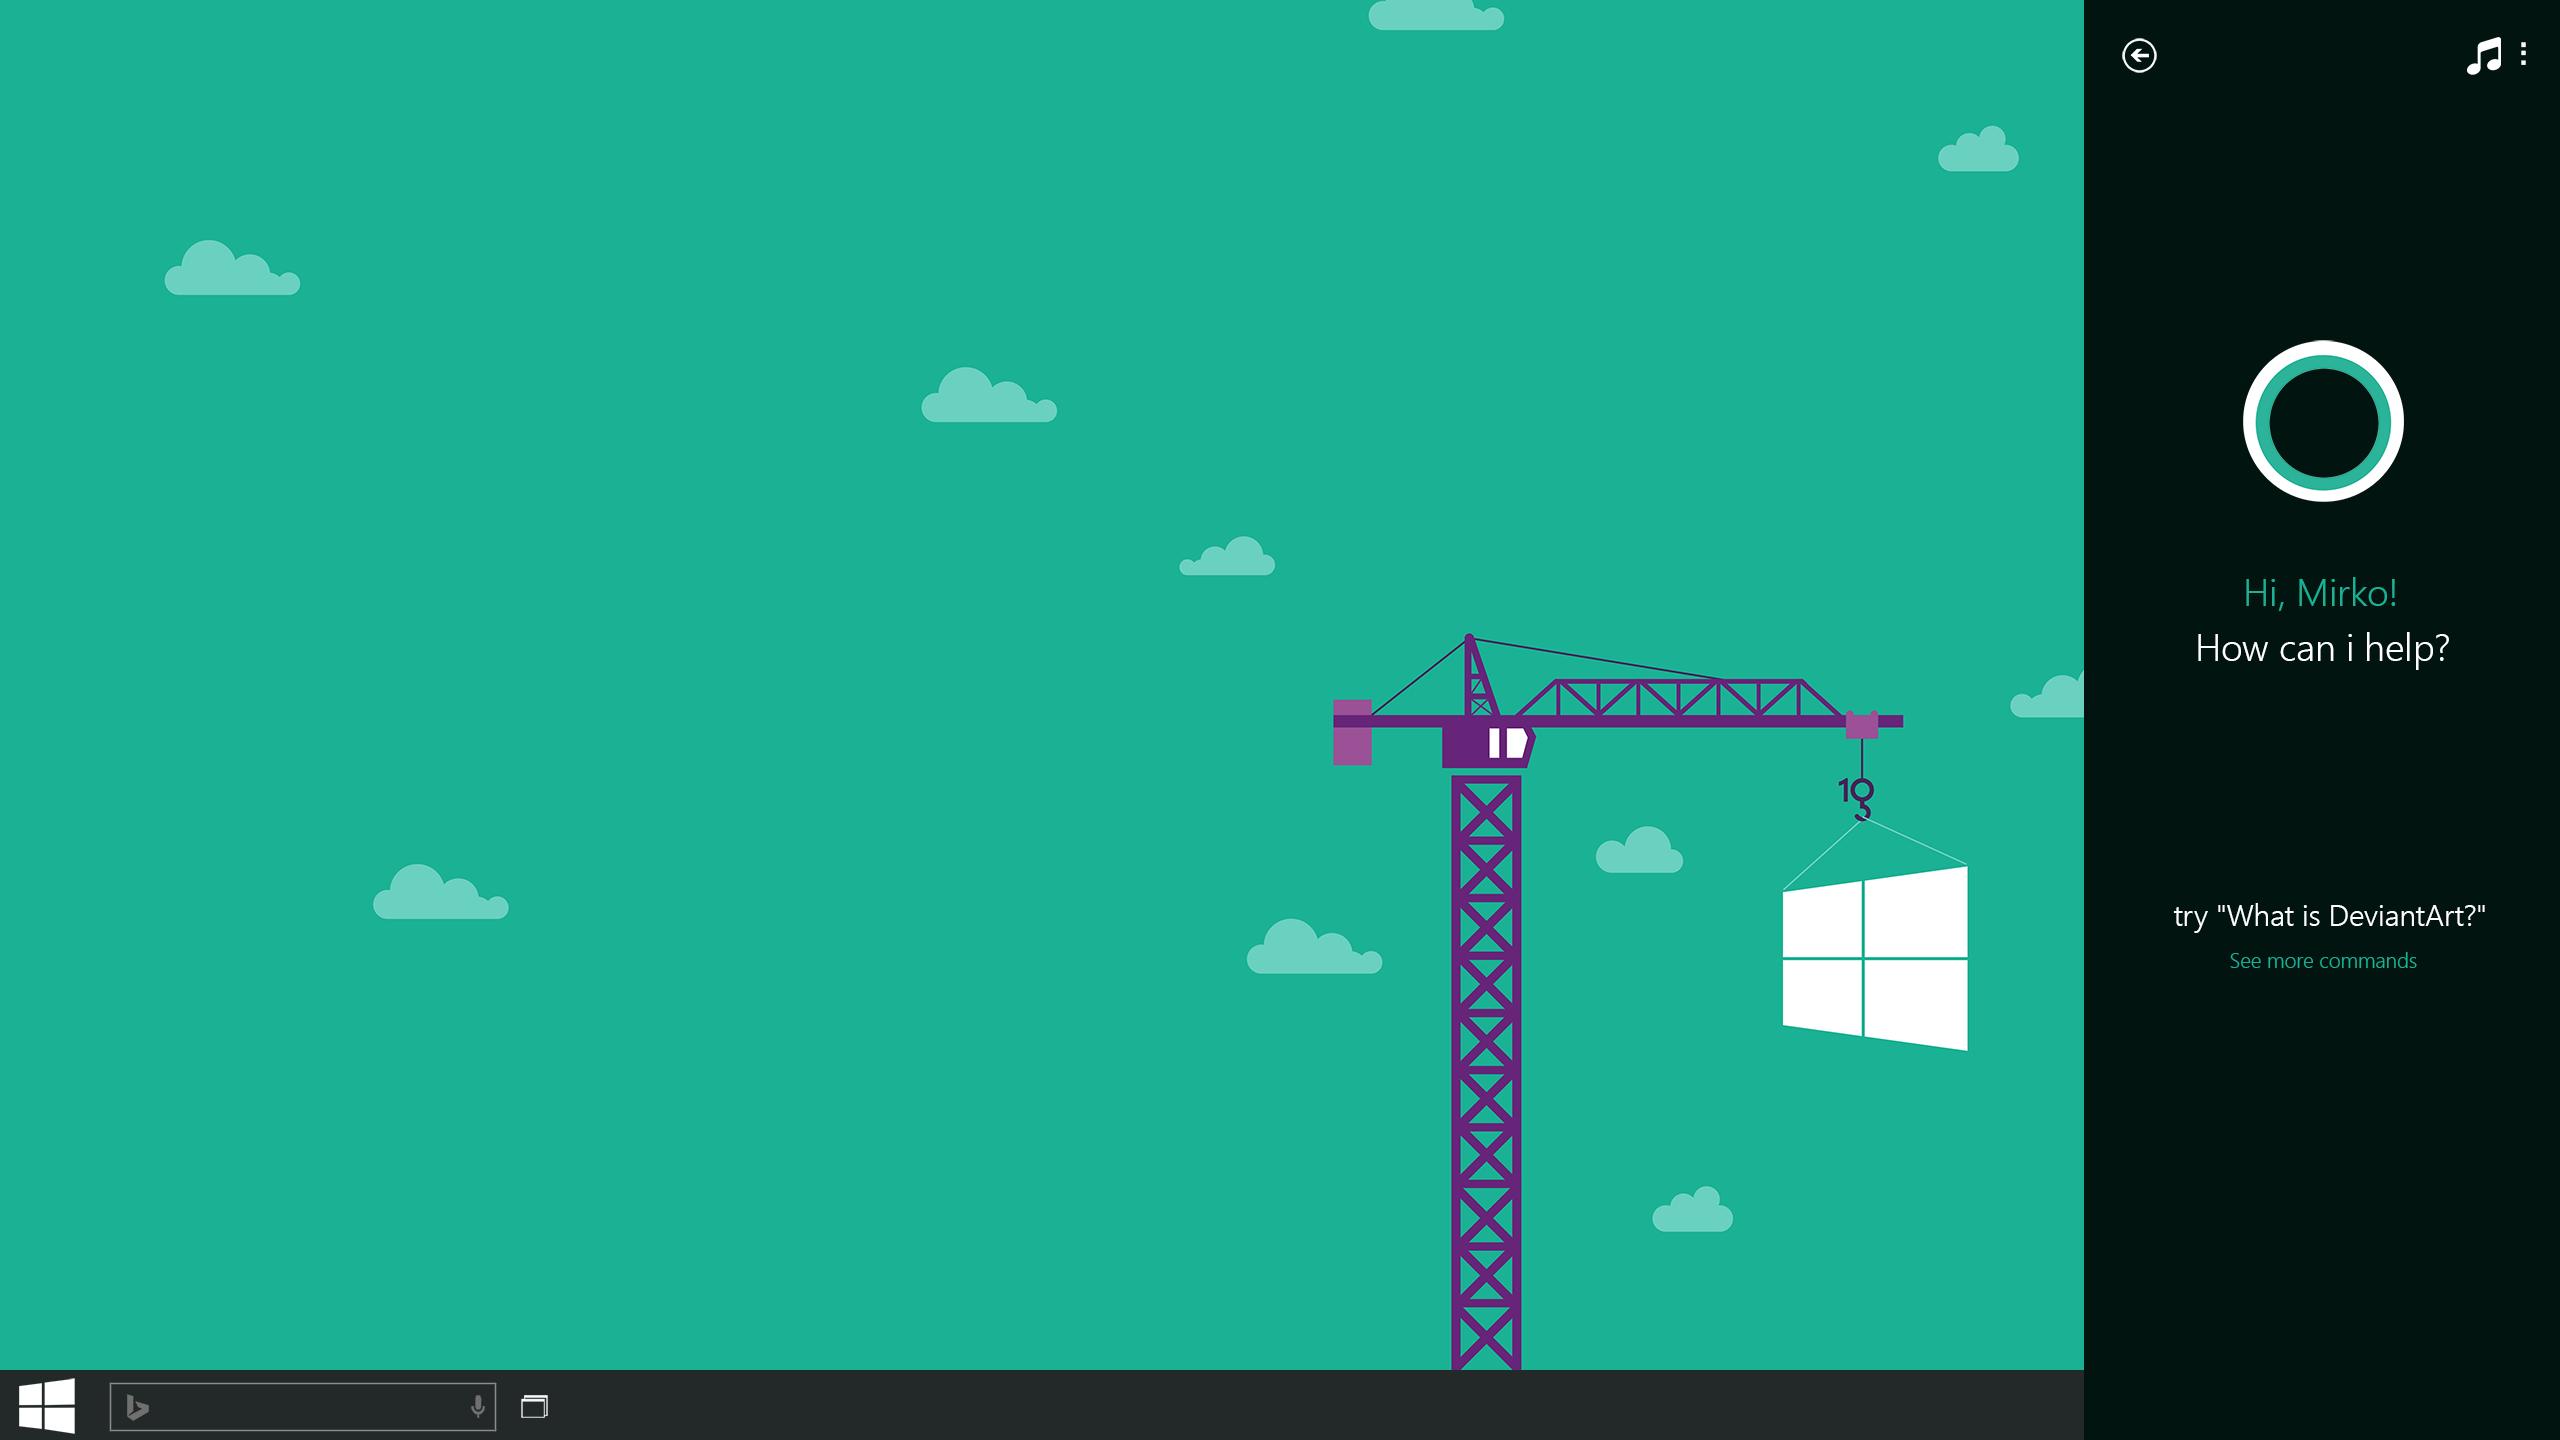 Cortana Windows 10 Wallpaper Wallpapersafari